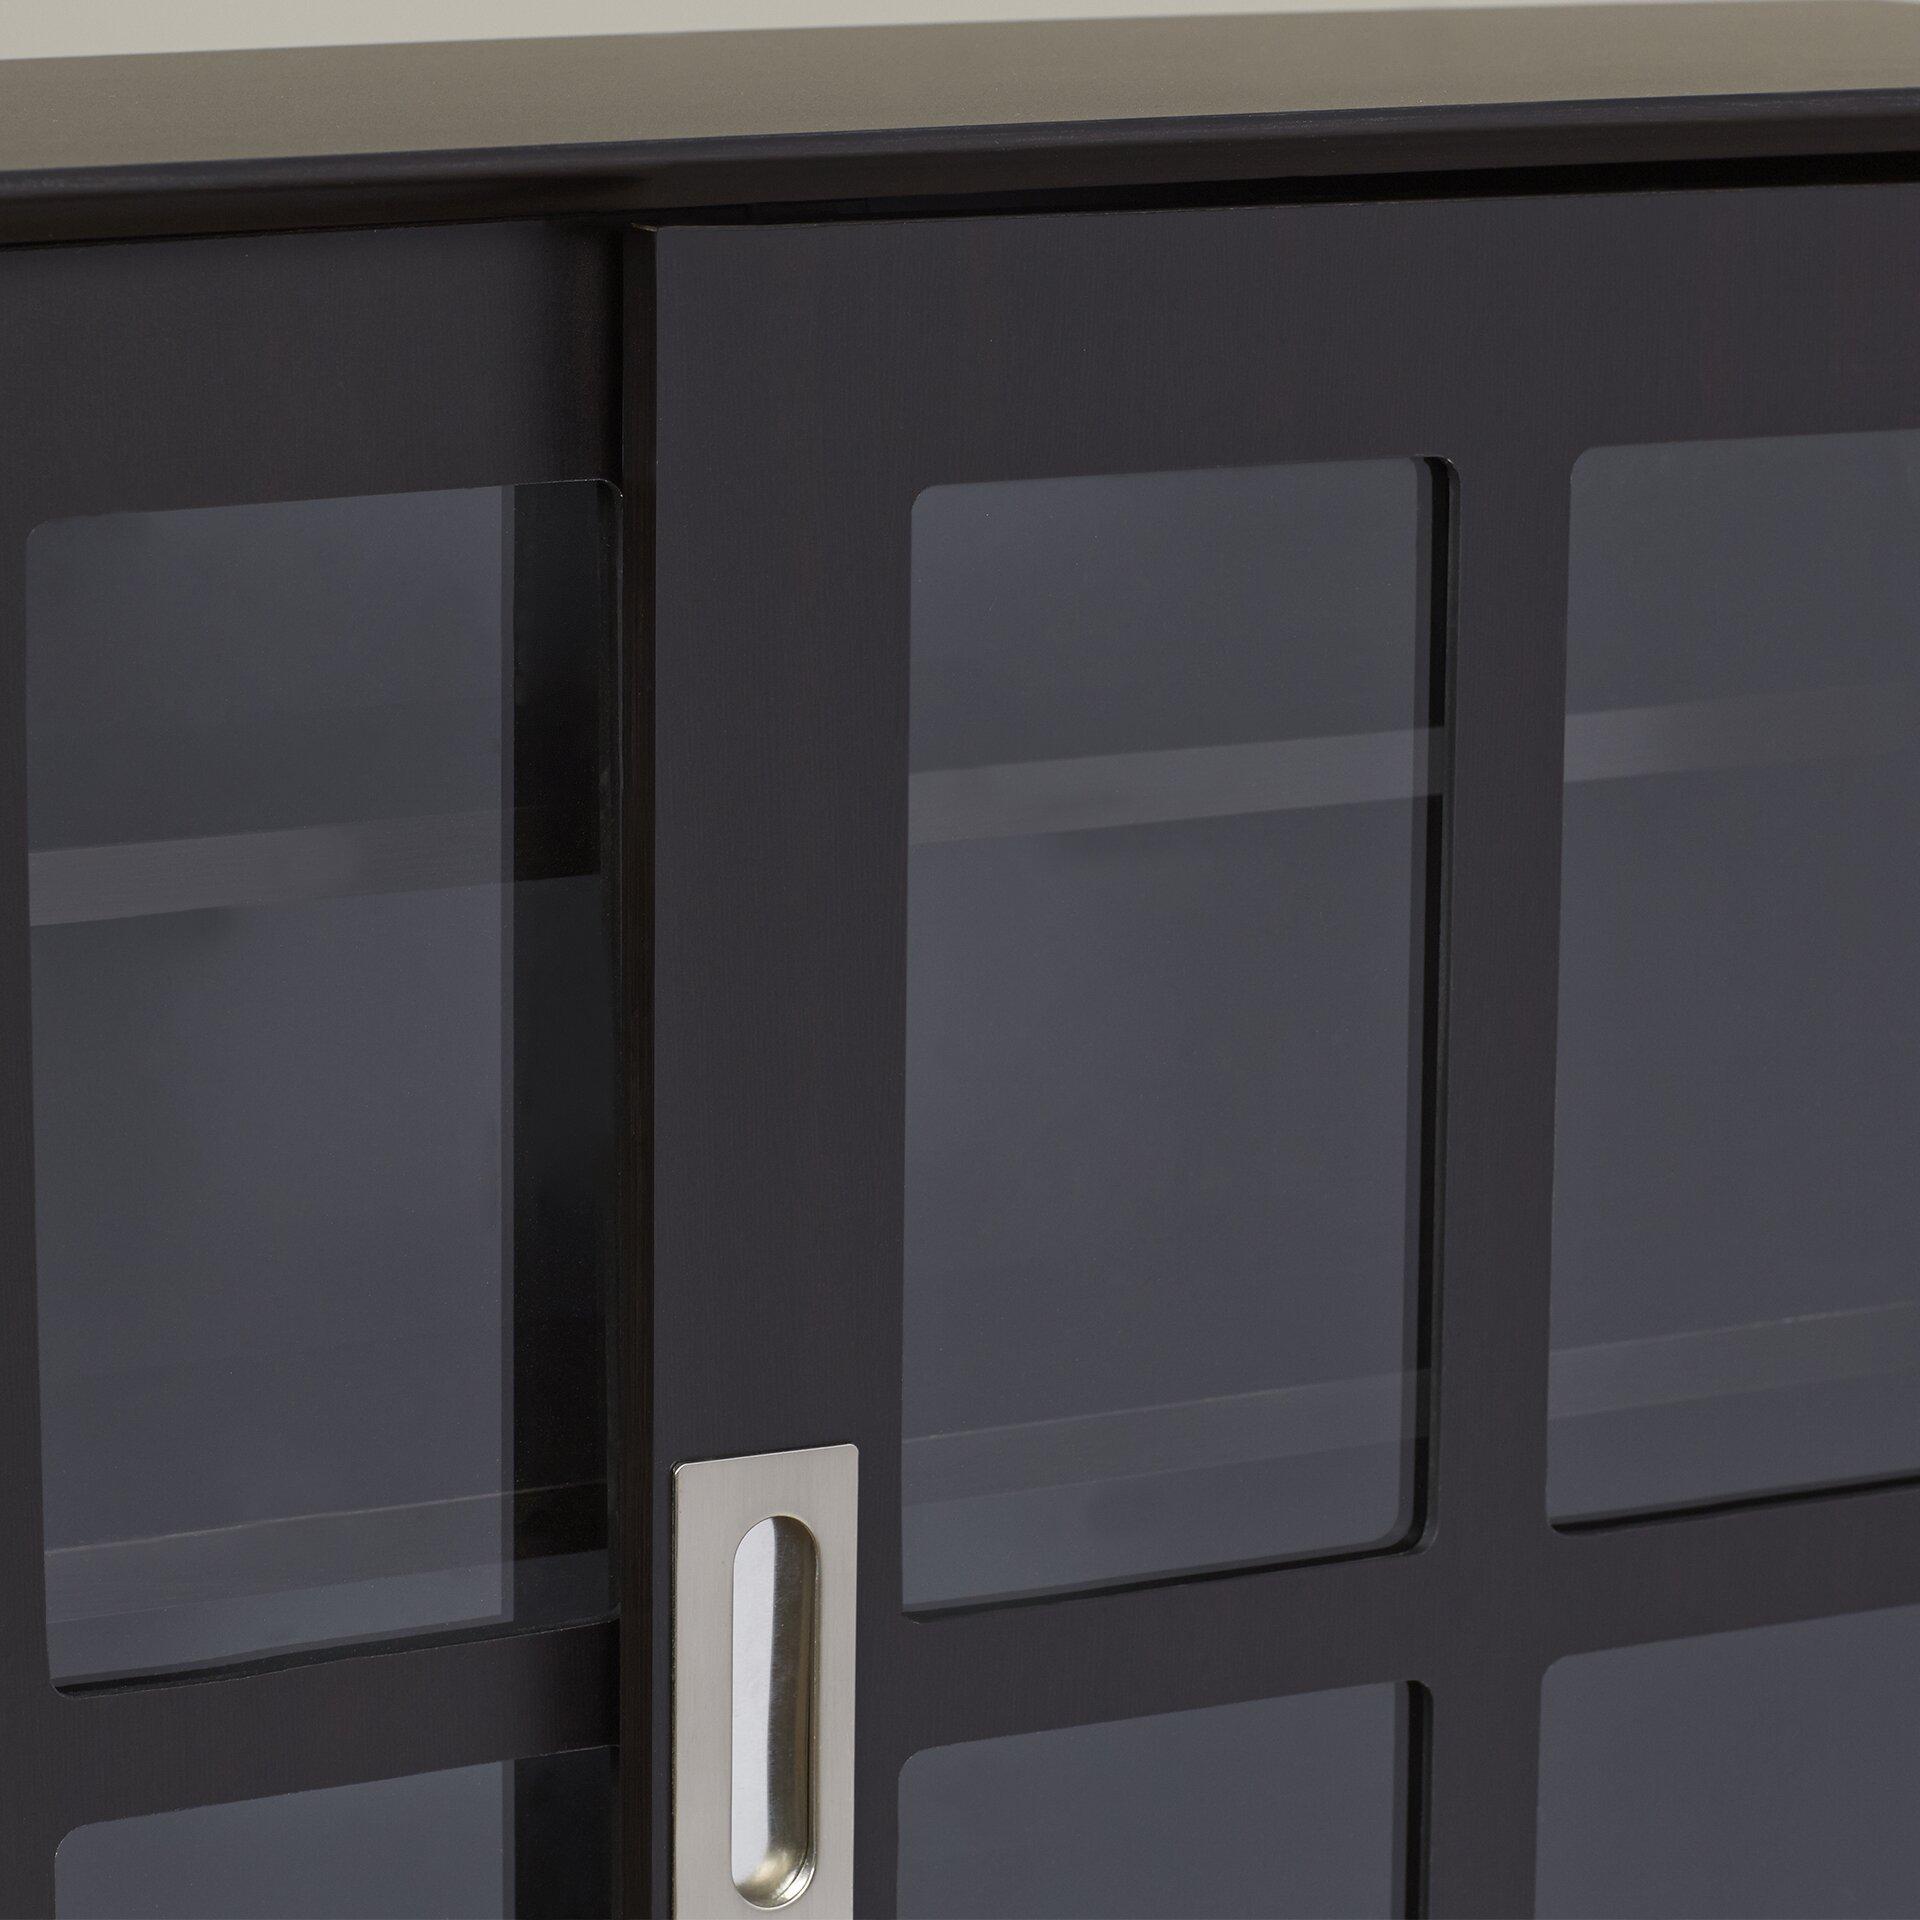 andover mills oscar multimedia cabinet reviews wayfair. Black Bedroom Furniture Sets. Home Design Ideas